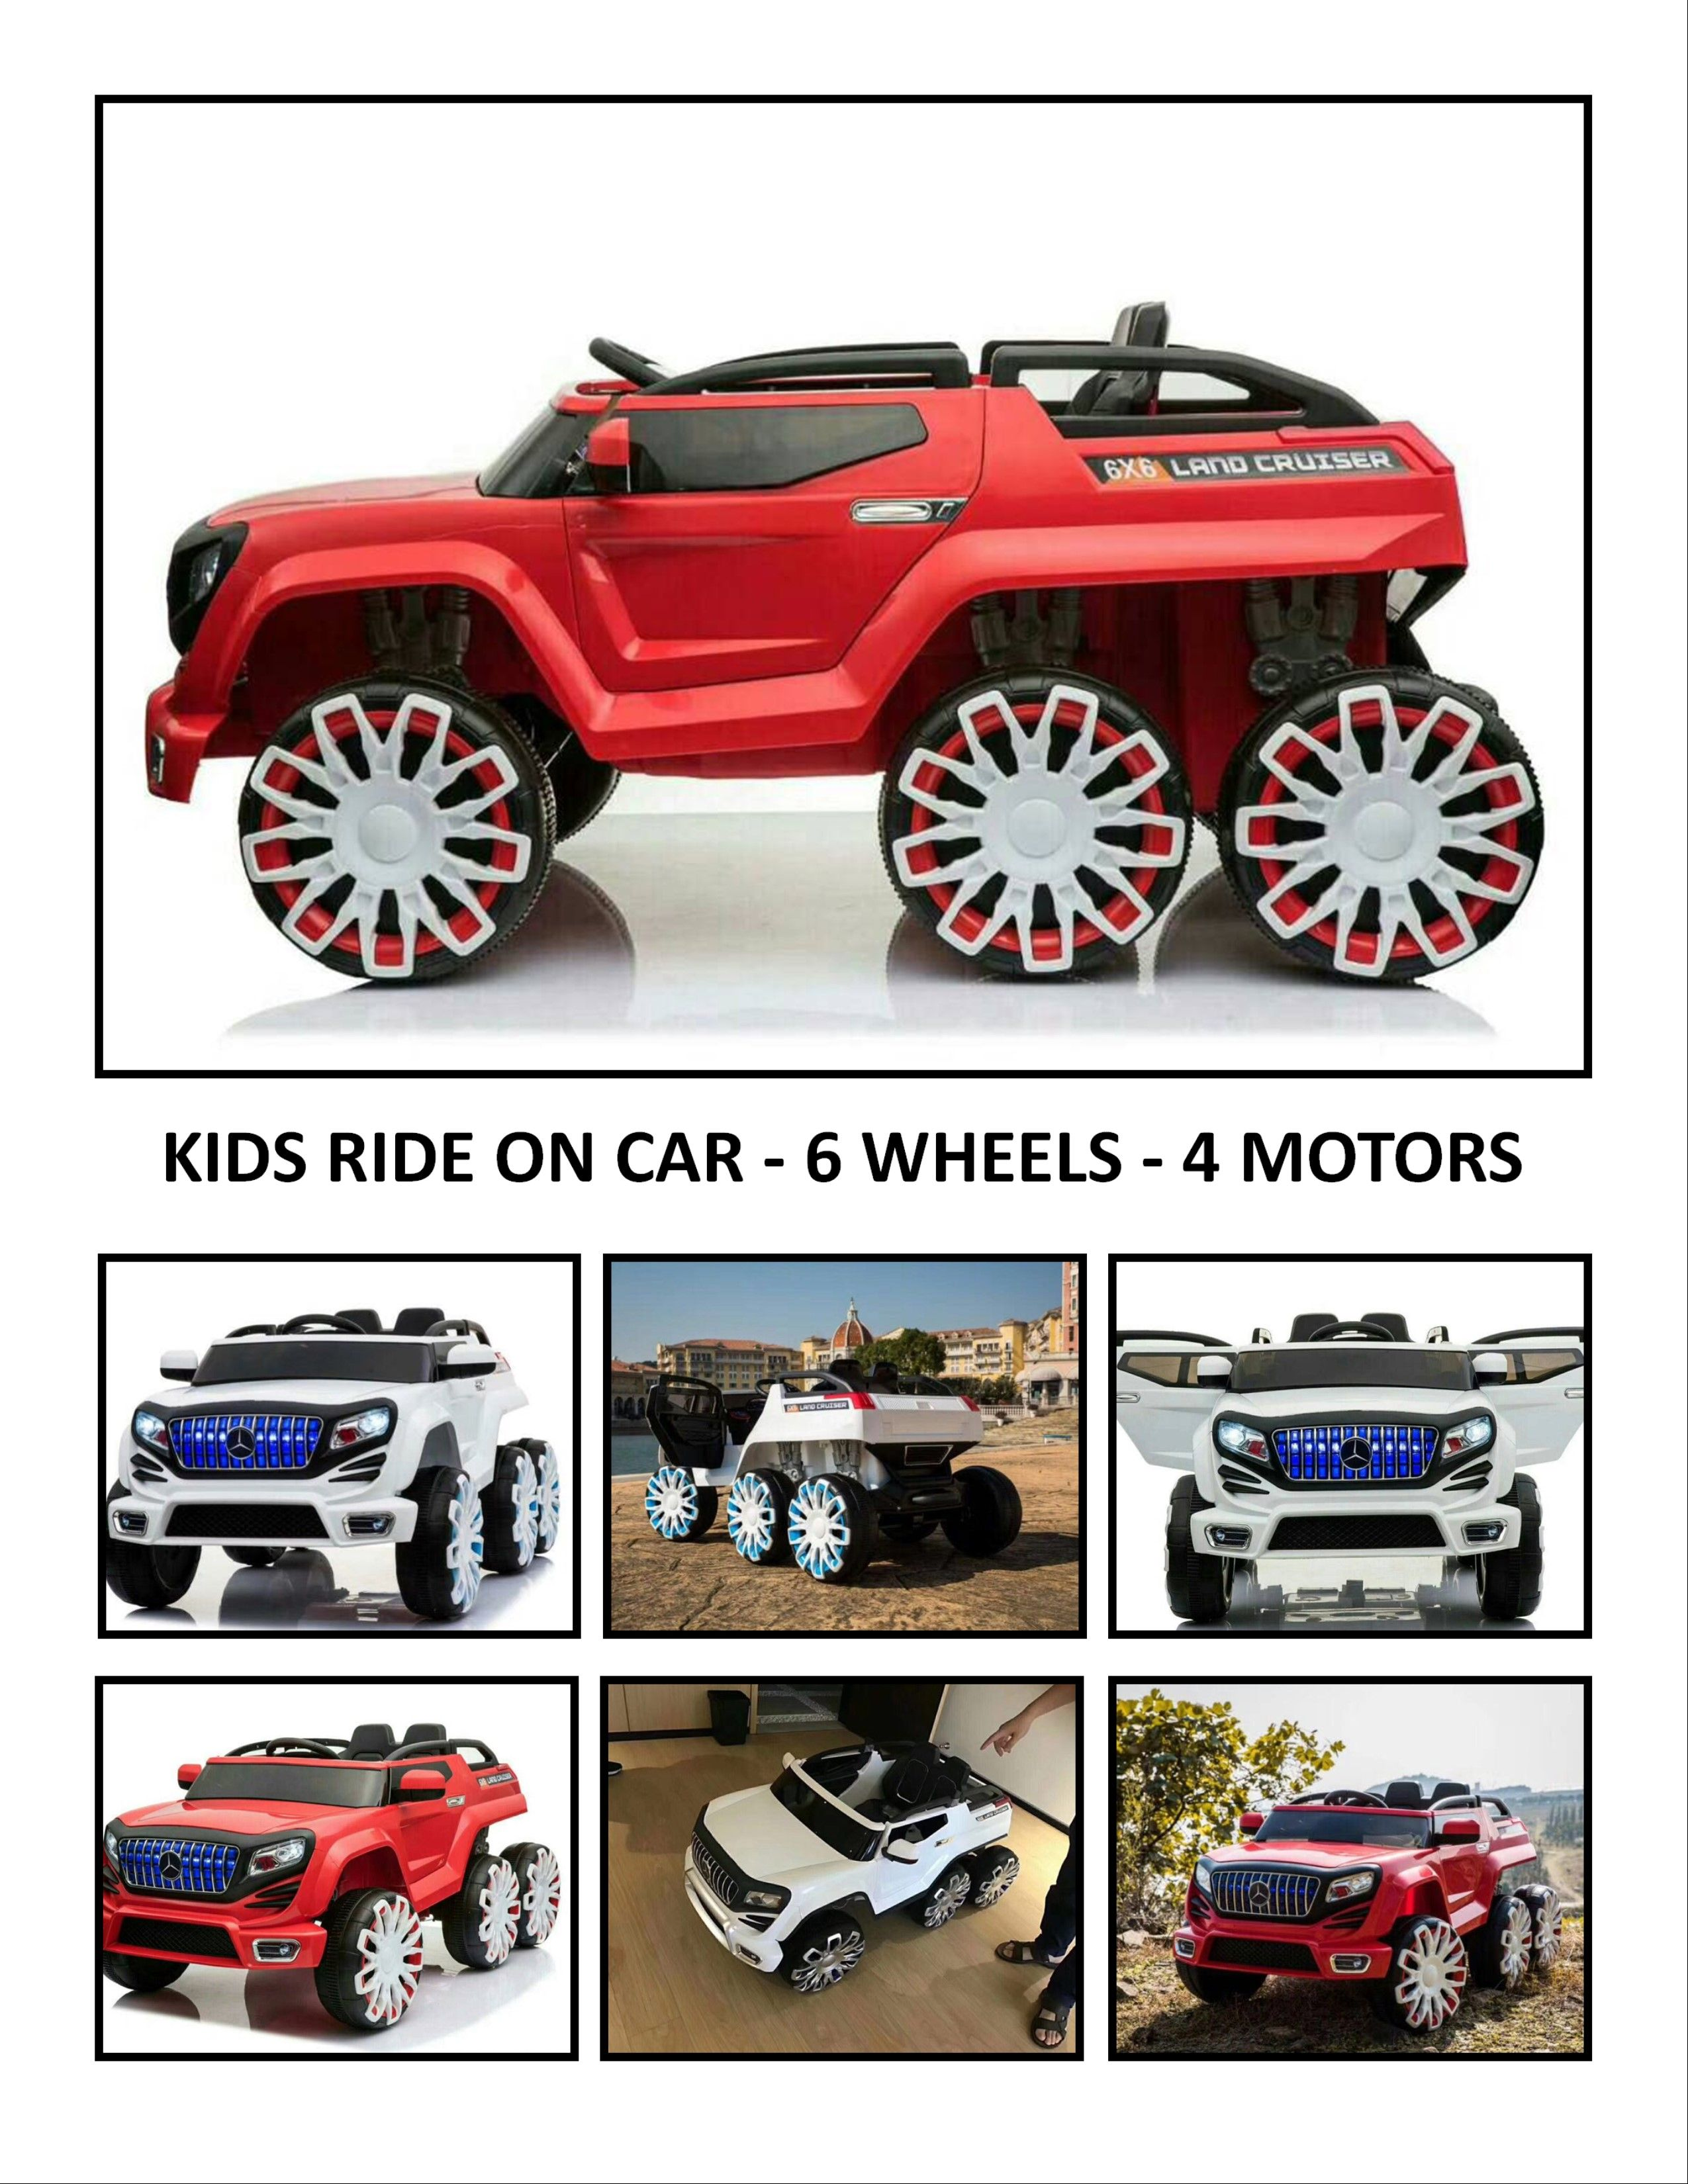 0ad7239d1 Kids Ride On Car - Land Cruiser - A Kids True Beast - 6 Wheels - 4 Working  Motors